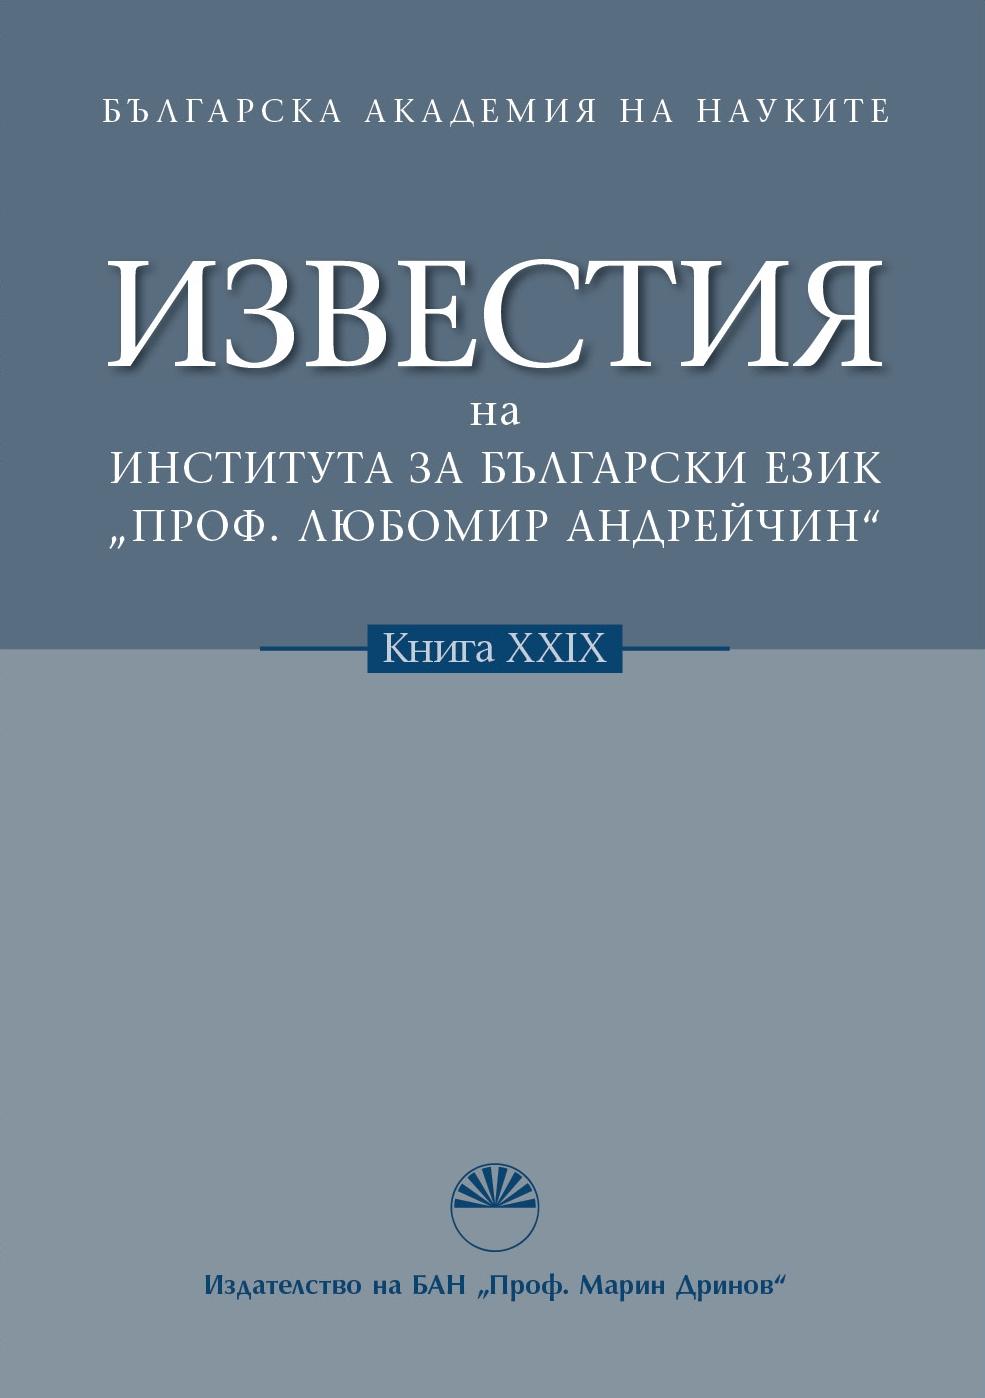 Izvestia BG Ezik  XXIX Cover (1a)